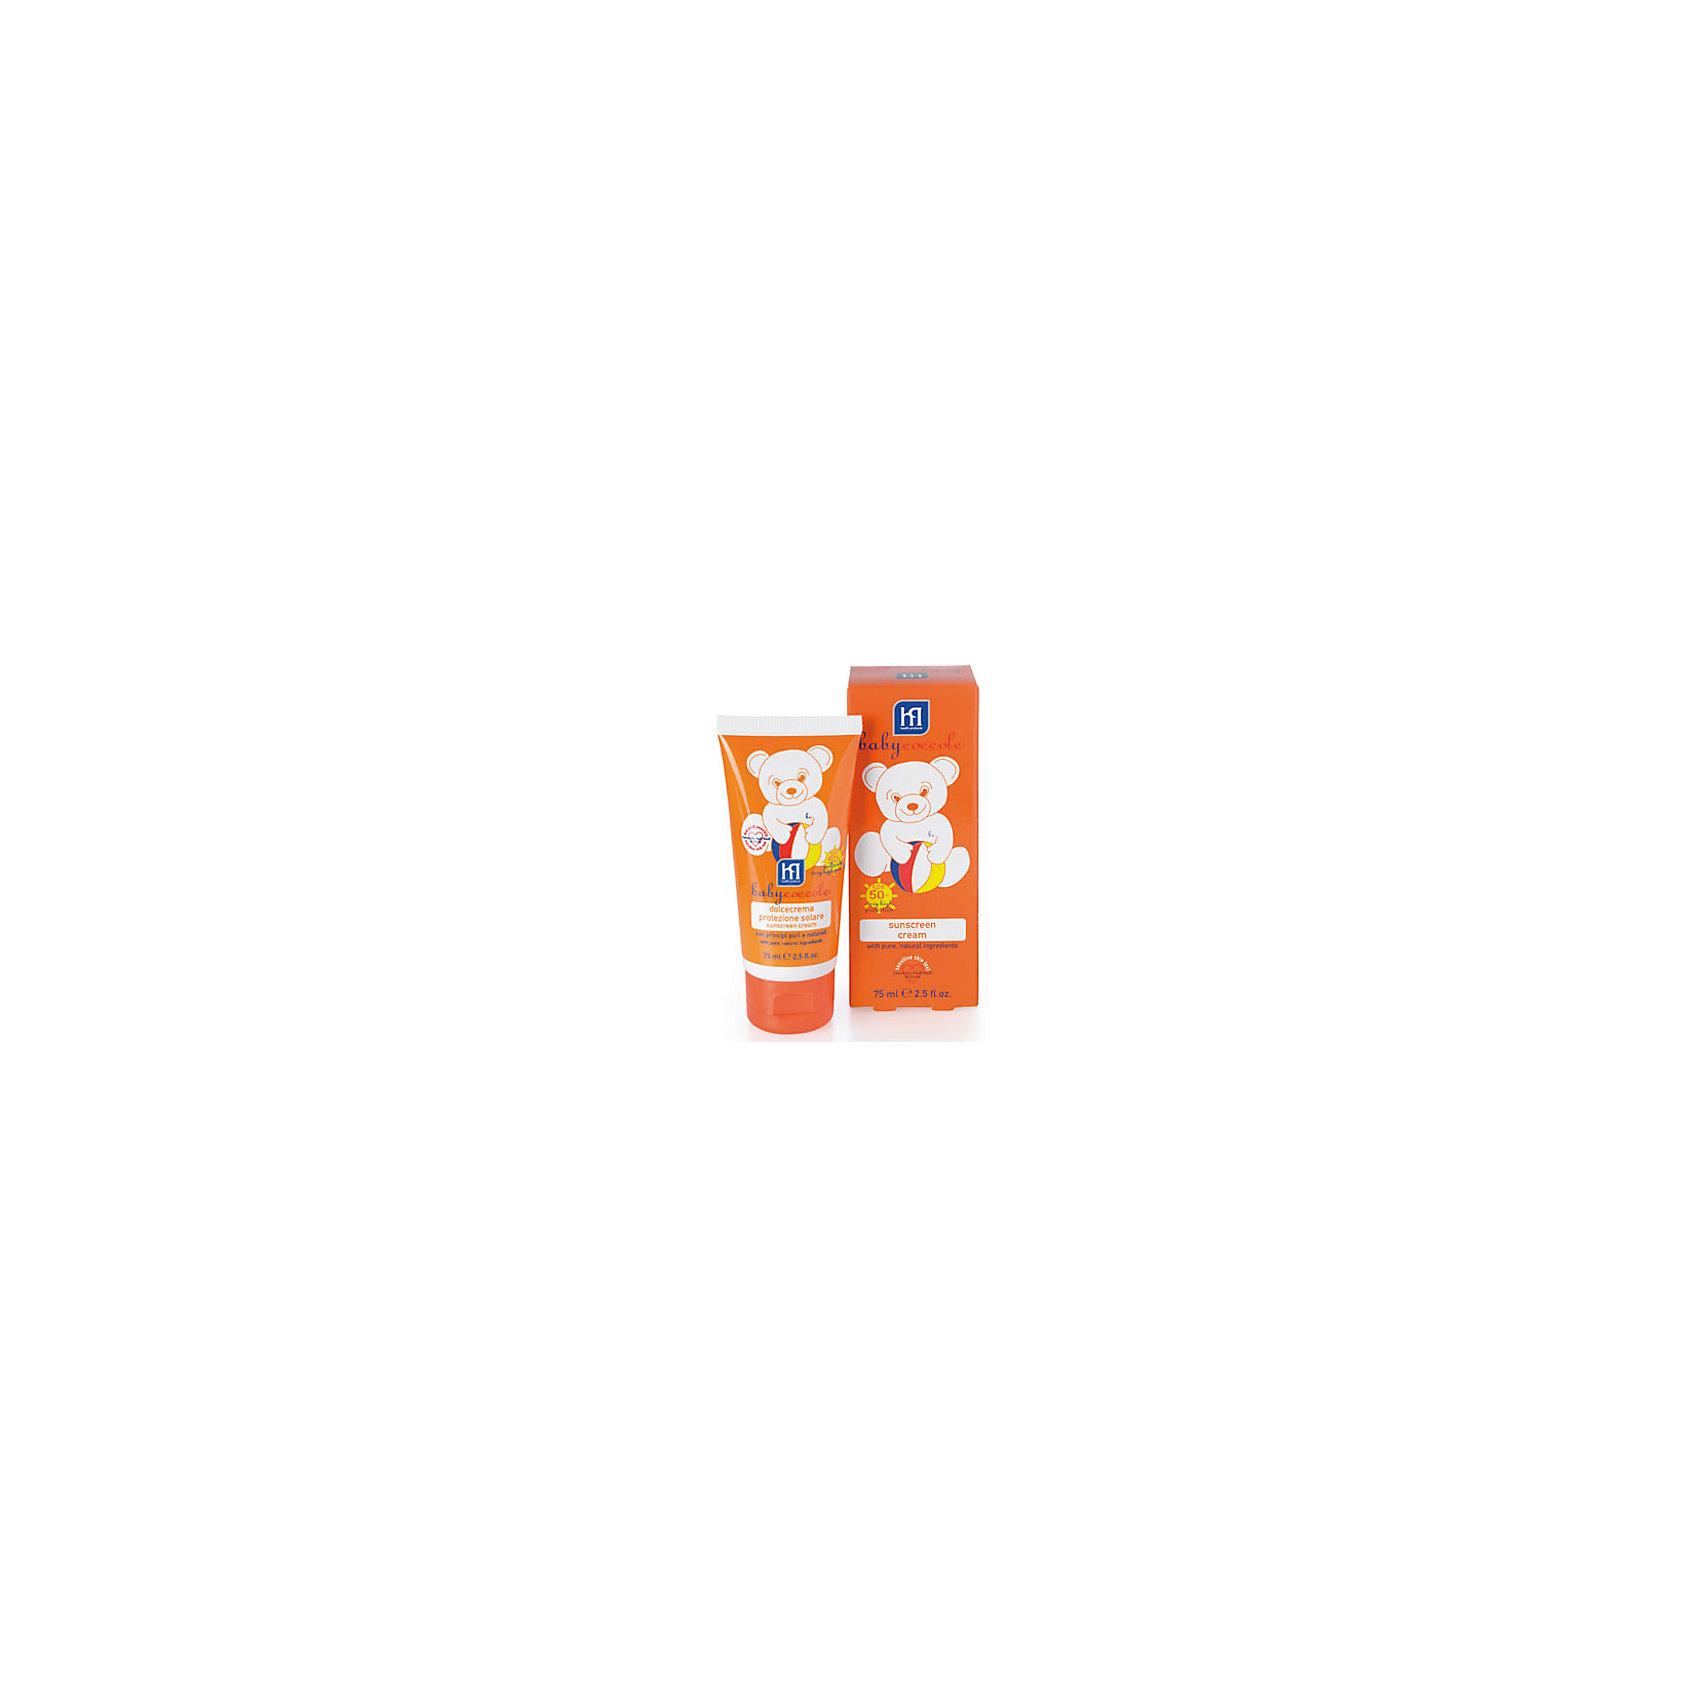 Babycoccole Крем солнцезащитный мягкий SPF50+ 75мл, Babycoccole babycoccole защитный крем от комаров 75мл babycoccole